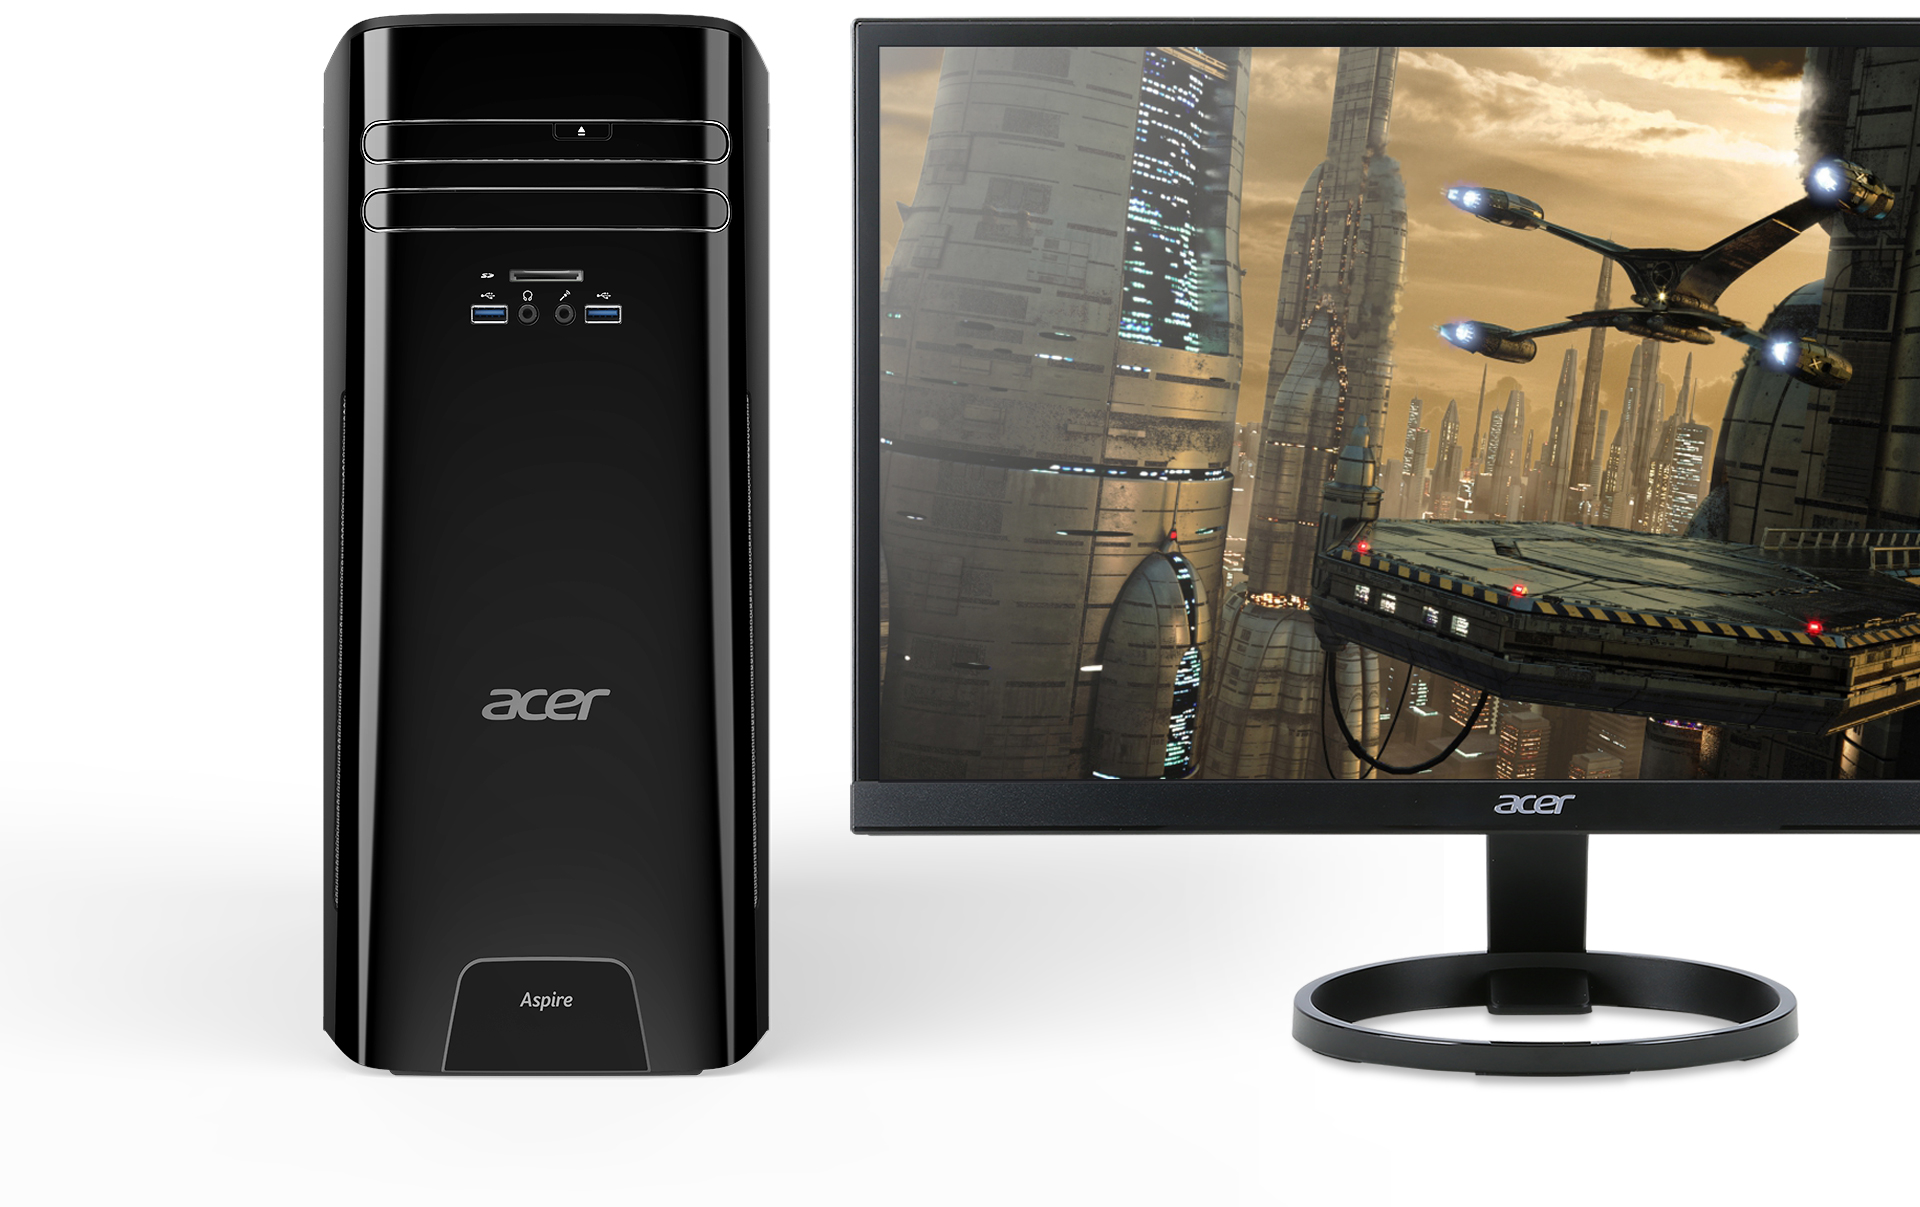 Aspire TC ksp - Advanced Graphics - Large